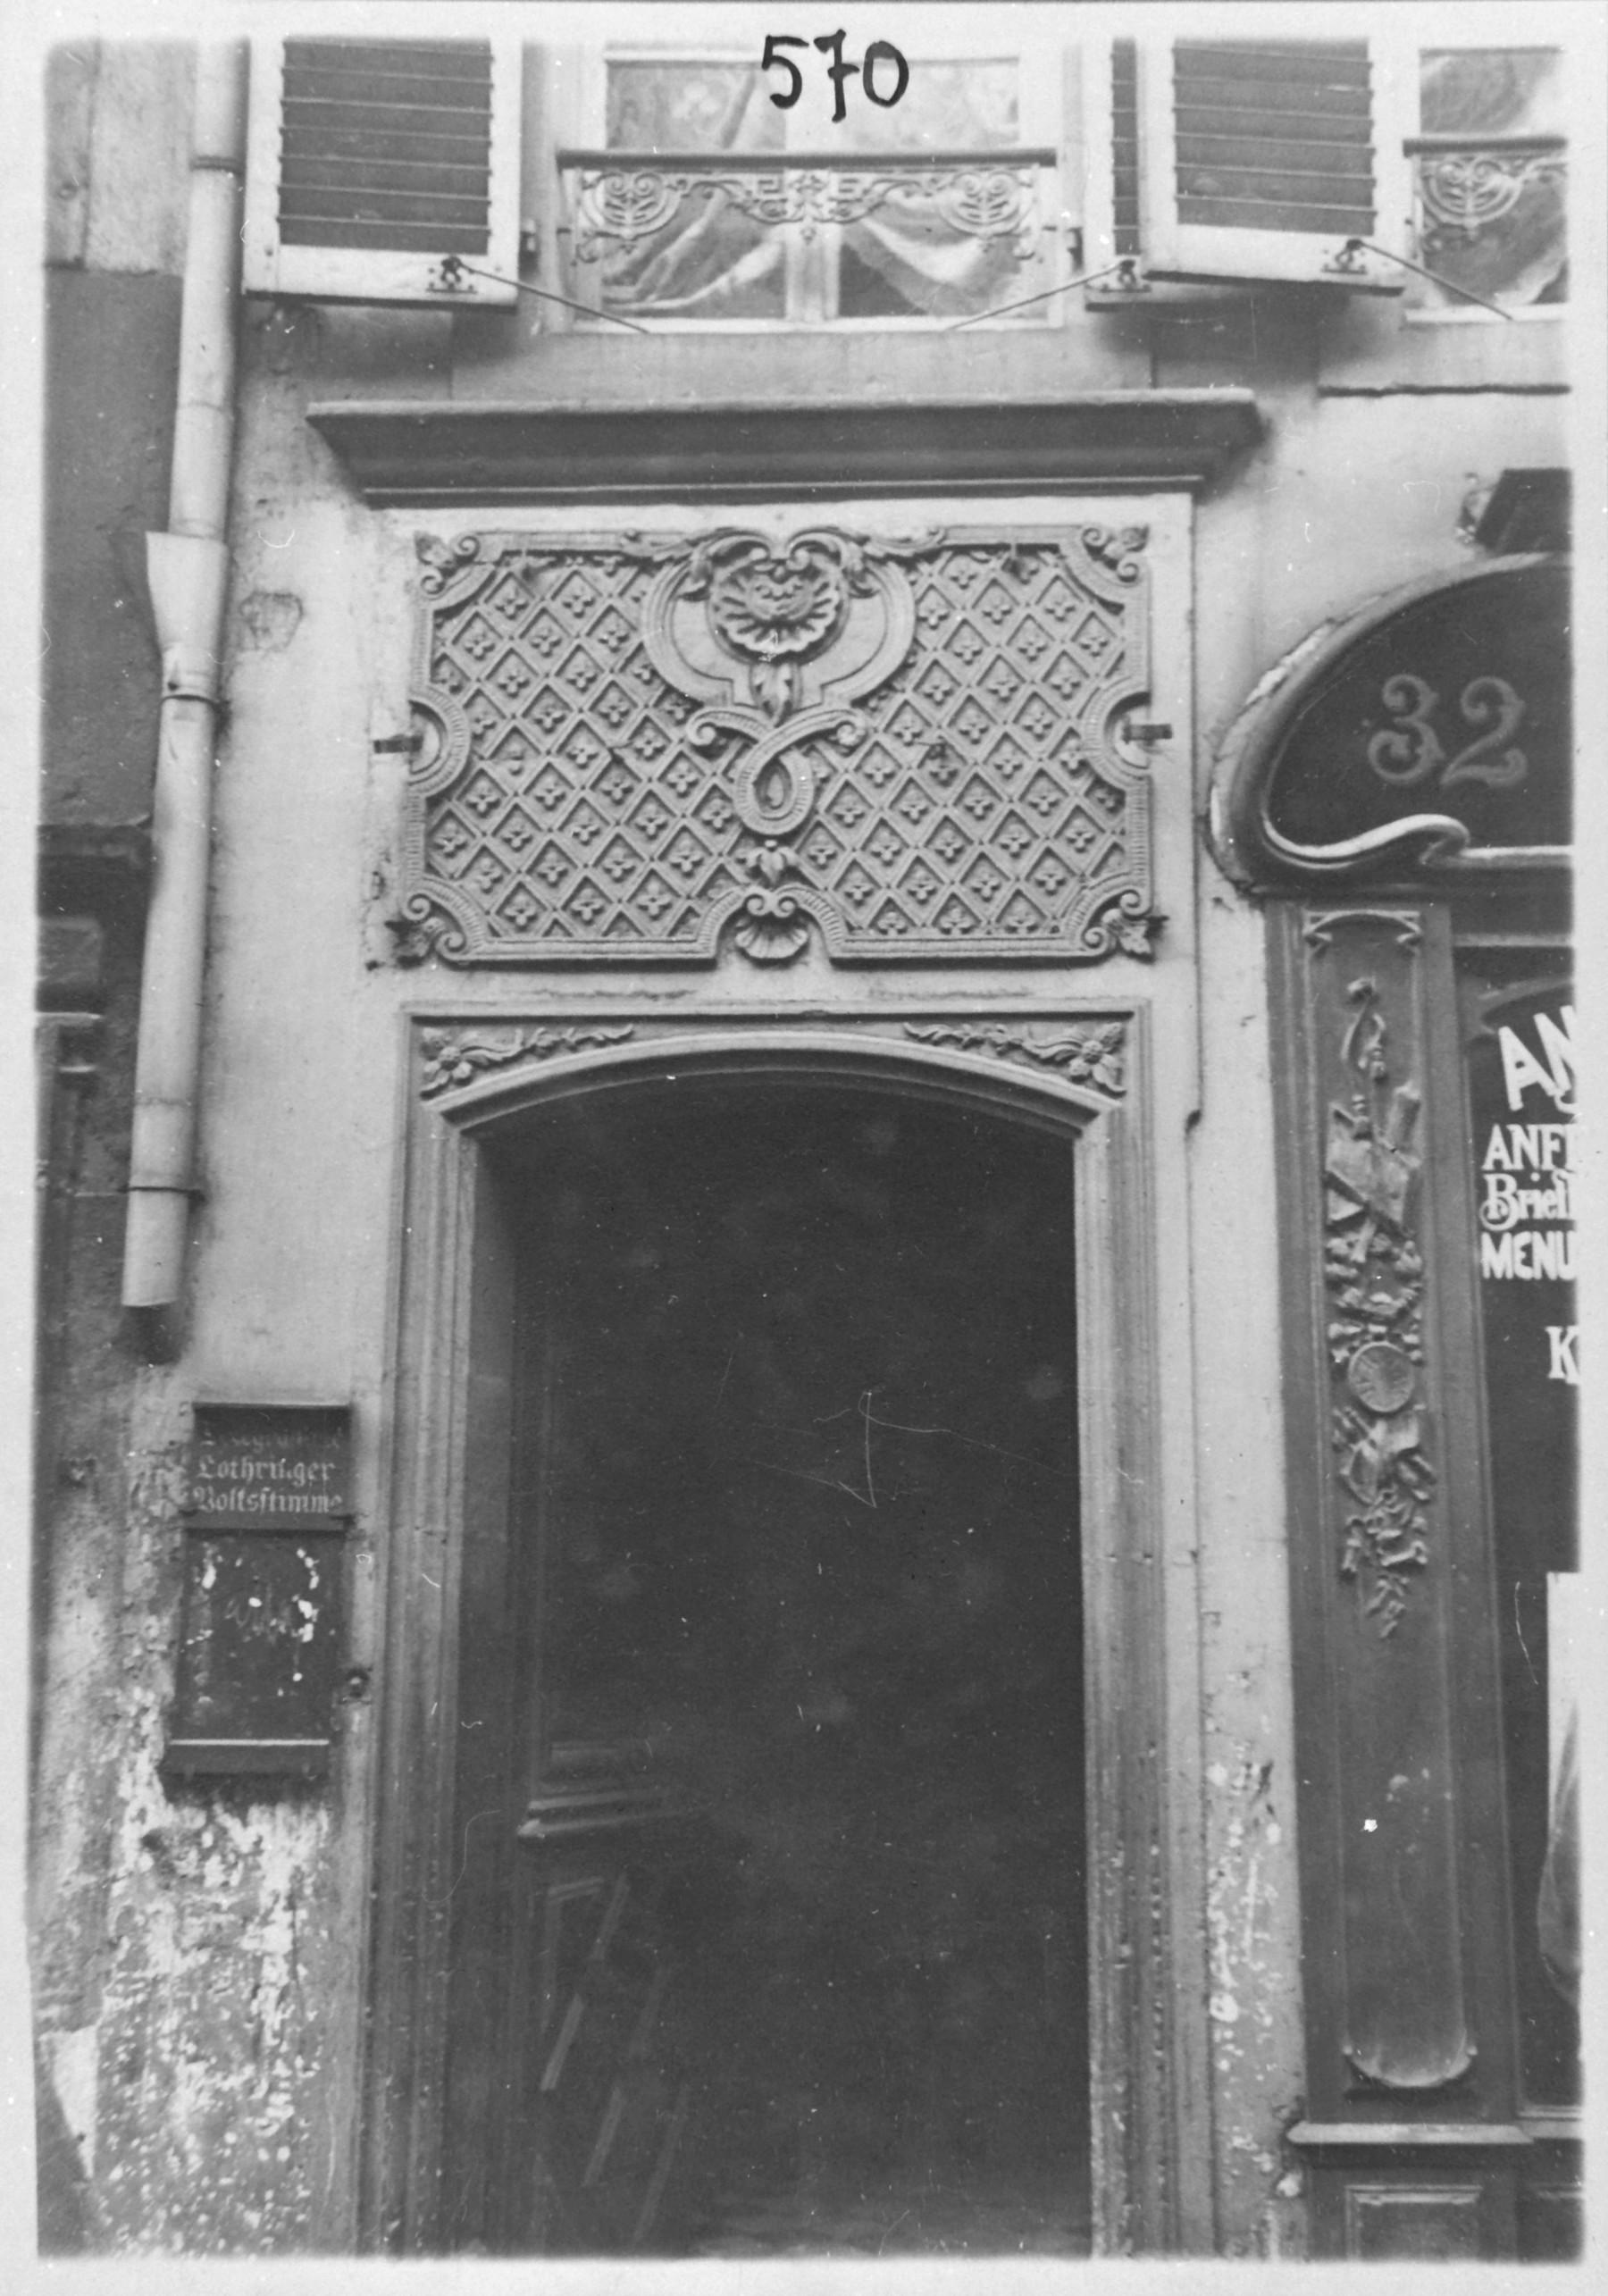 Contenu du Porte rue Mazelle